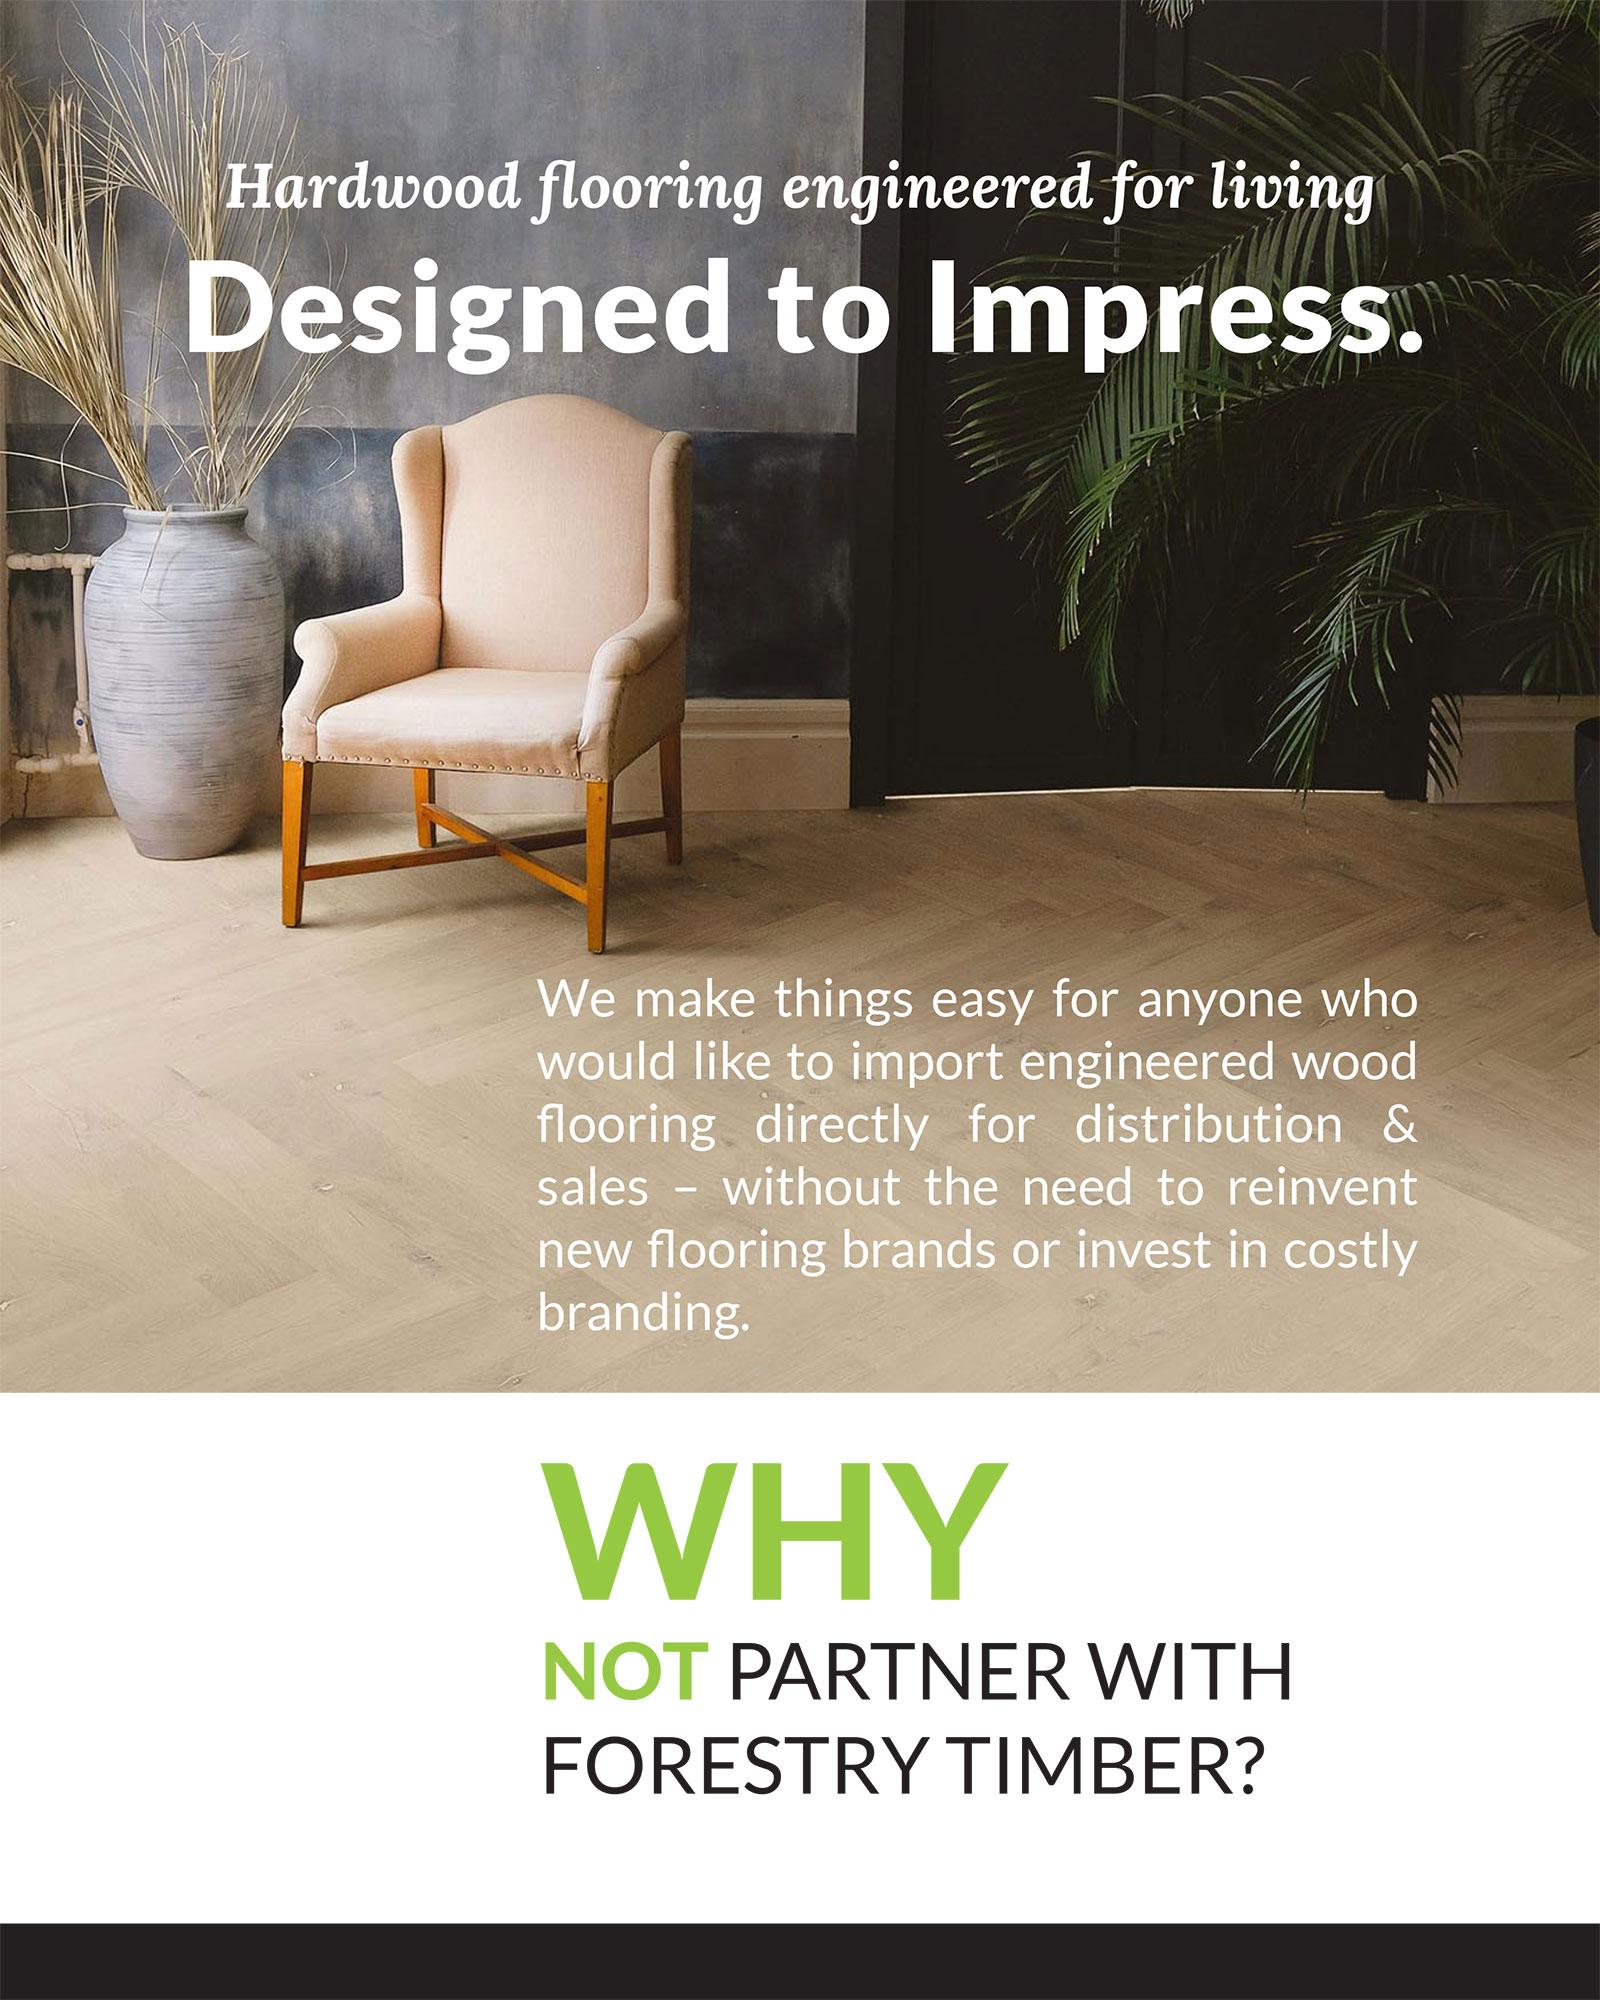 Forestry-Timber-Branding-Partnership